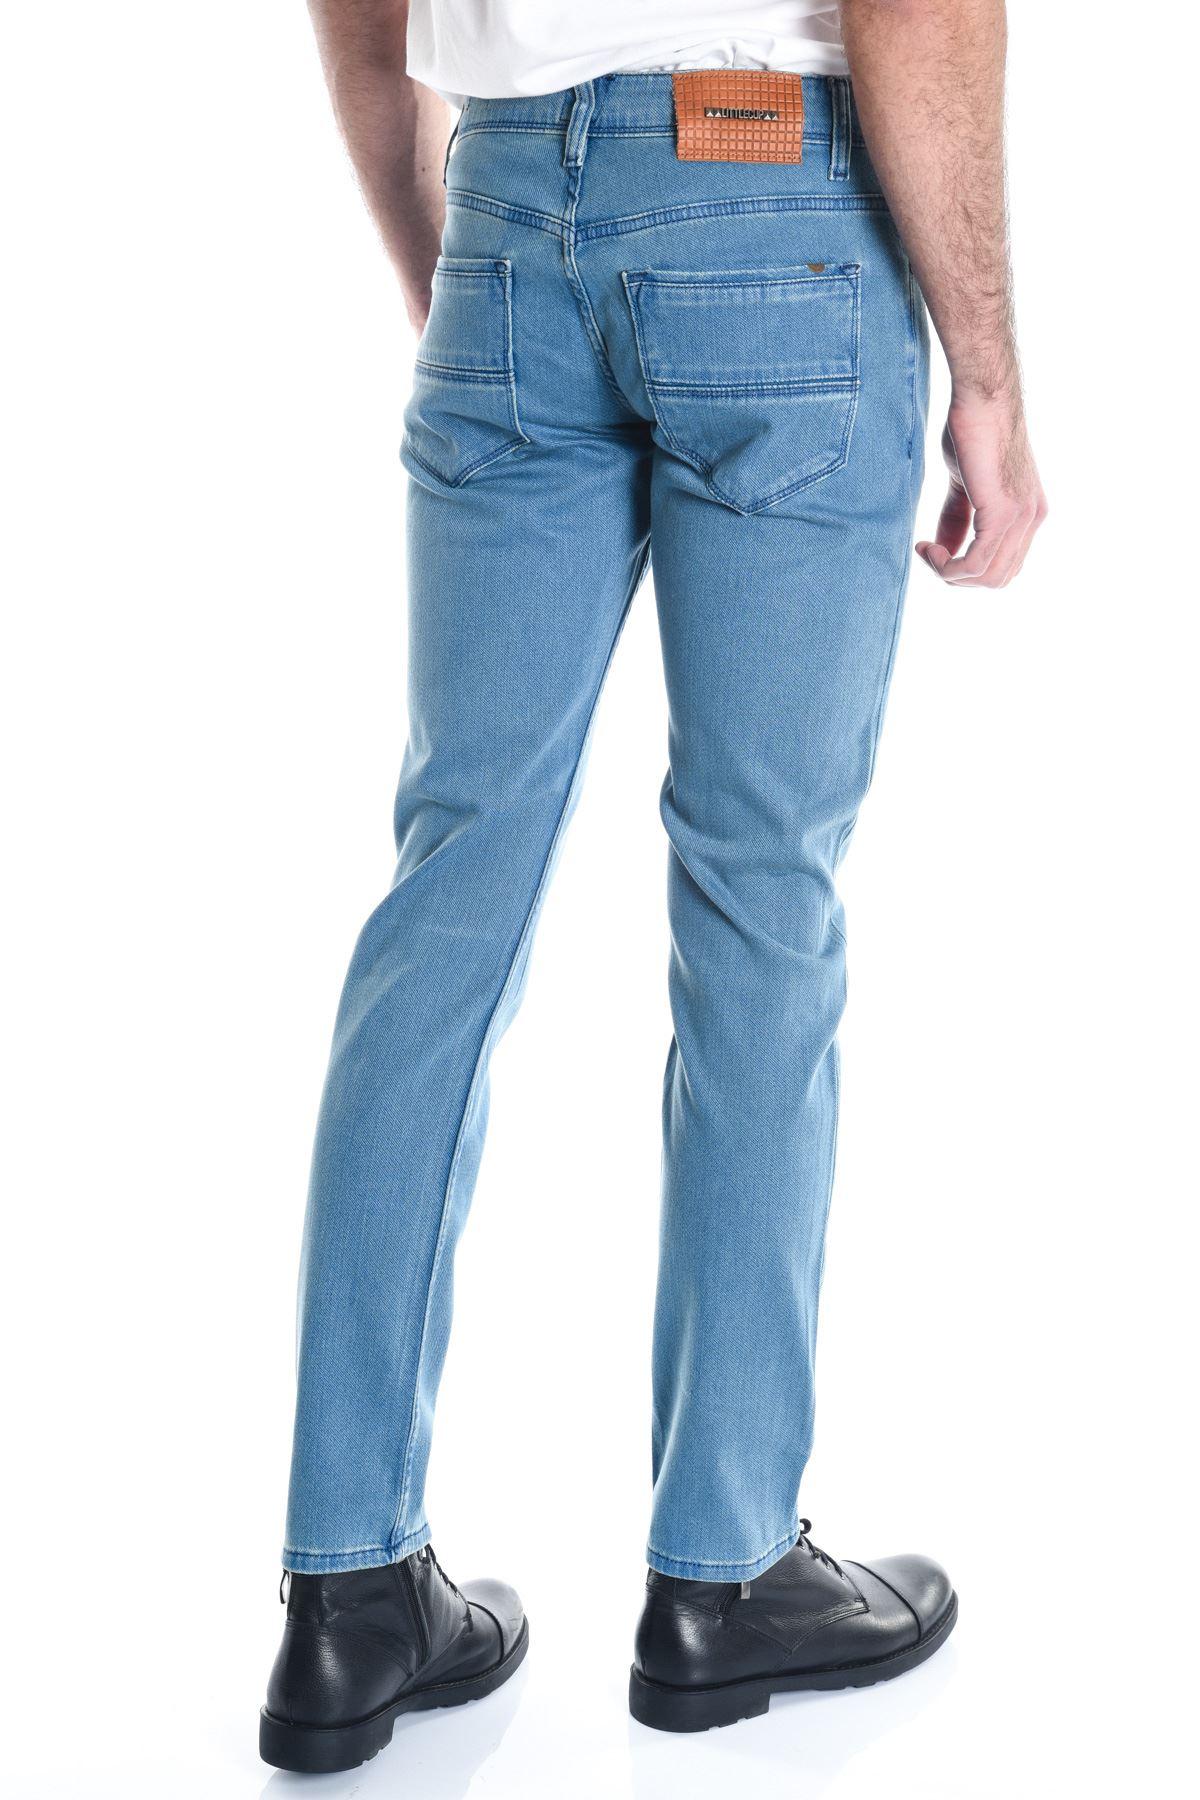 Mavi Sade Örme Kumaş Erkek Kot Pantolon